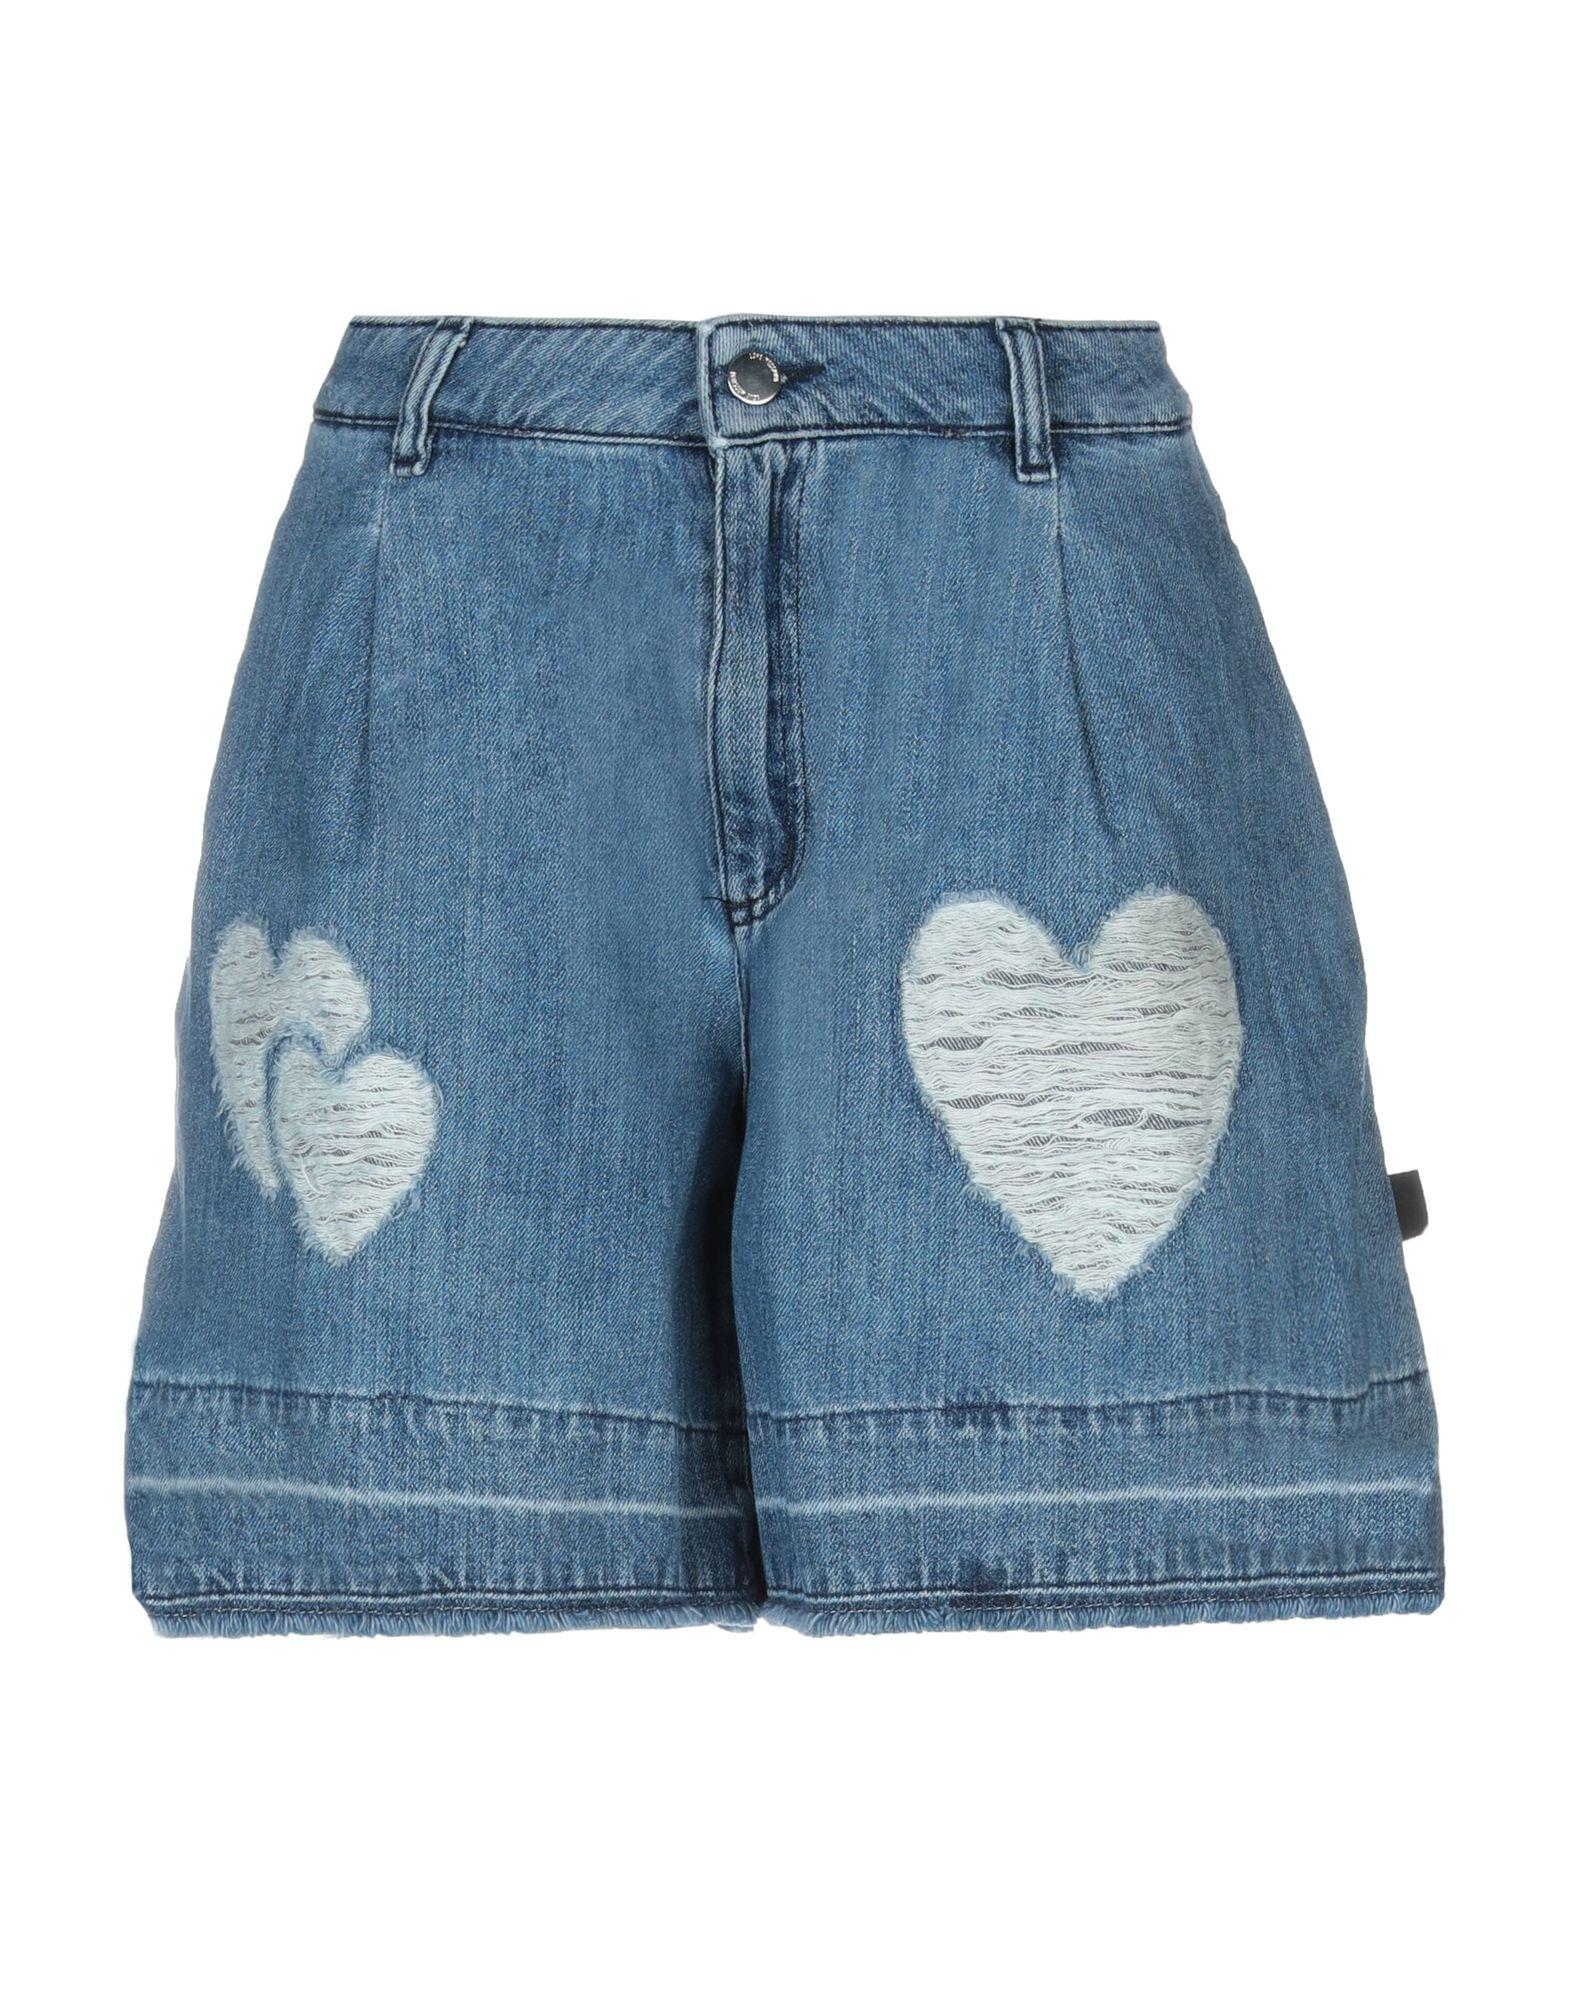 LOVE MOSCHINO Джинсовые шорты love moschino шорты love moschino cf w o 068 00 t 7757 y13 голубой